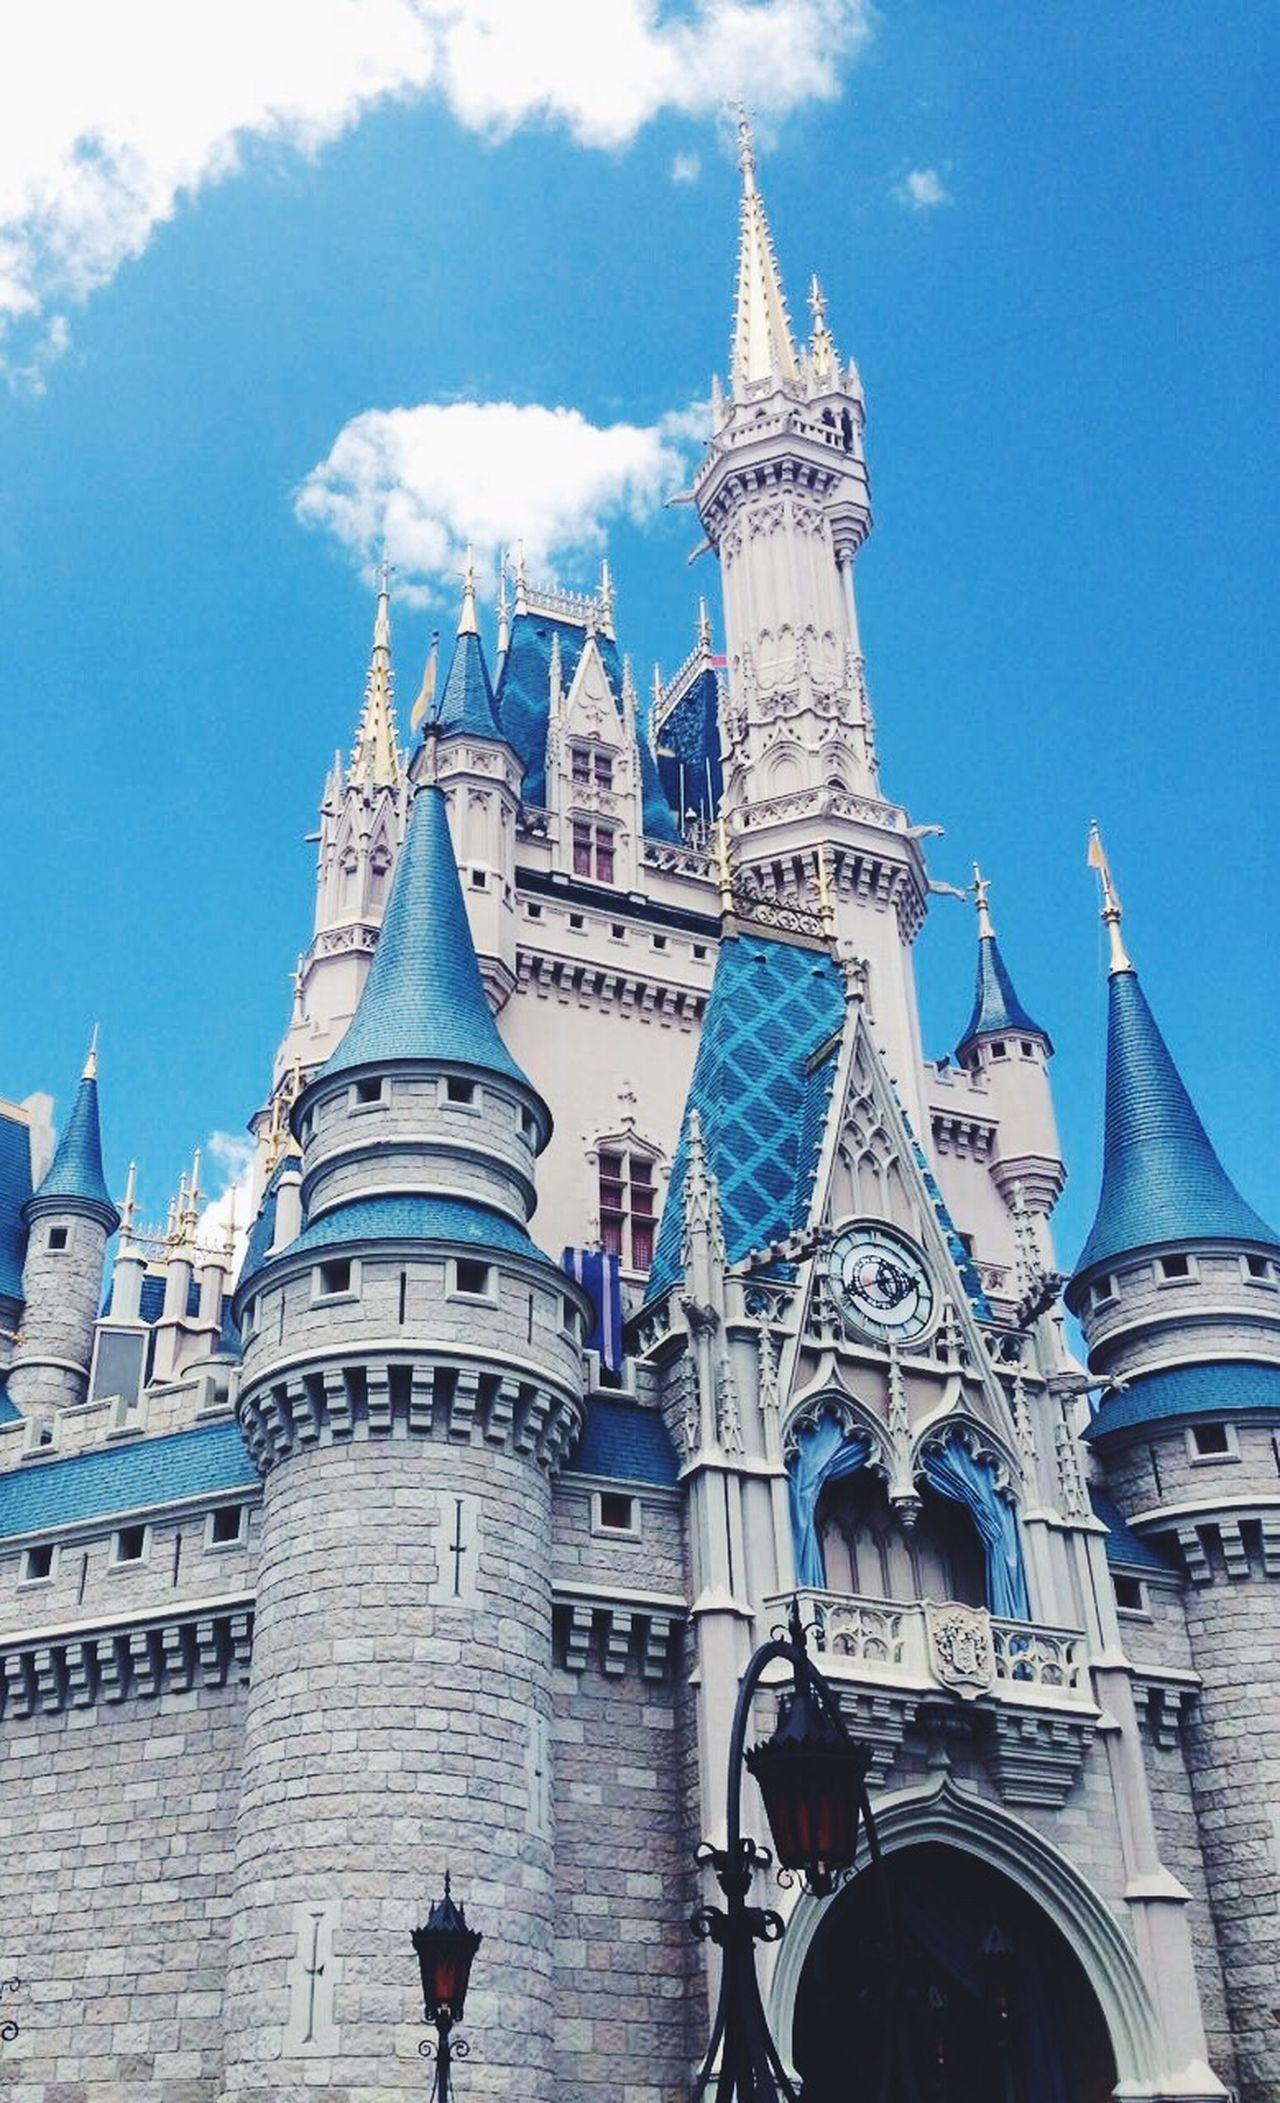 Disney DisneyWorld Architecture Orlando Magic Kingdom Castle Cinderella Cinderella Castle Built Structure Travel Destinations Low Angle View Tourism Sky Day Dome Outdoors No People